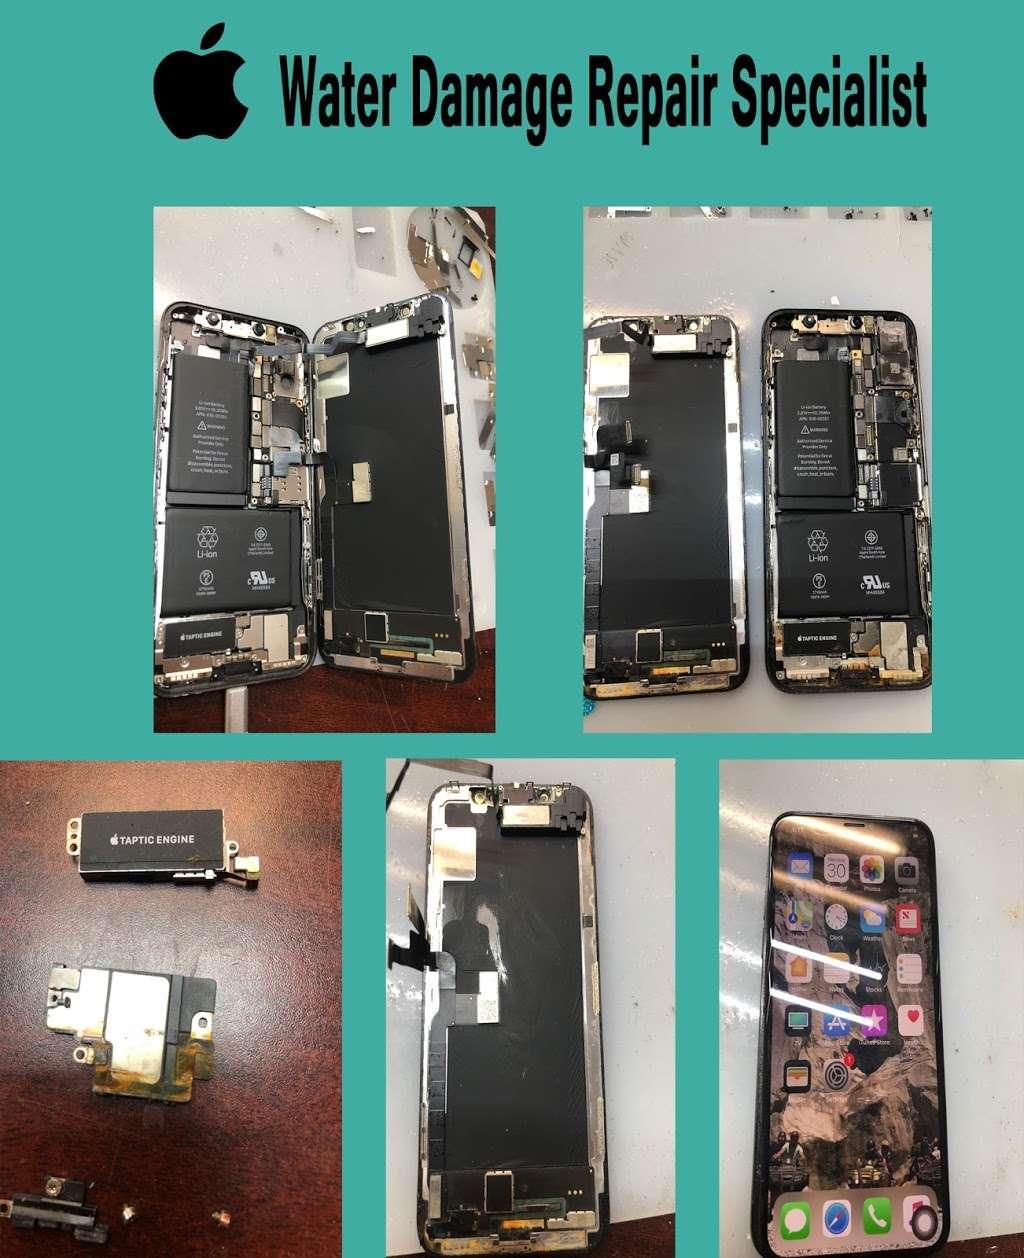 WIRELESS 4G (#1 Ranked iPhone Repair Center) - store  | Photo 8 of 10 | Address: 12611 Woodforest Blvd, Houston, TX 77015, USA | Phone: (713) 330-9400